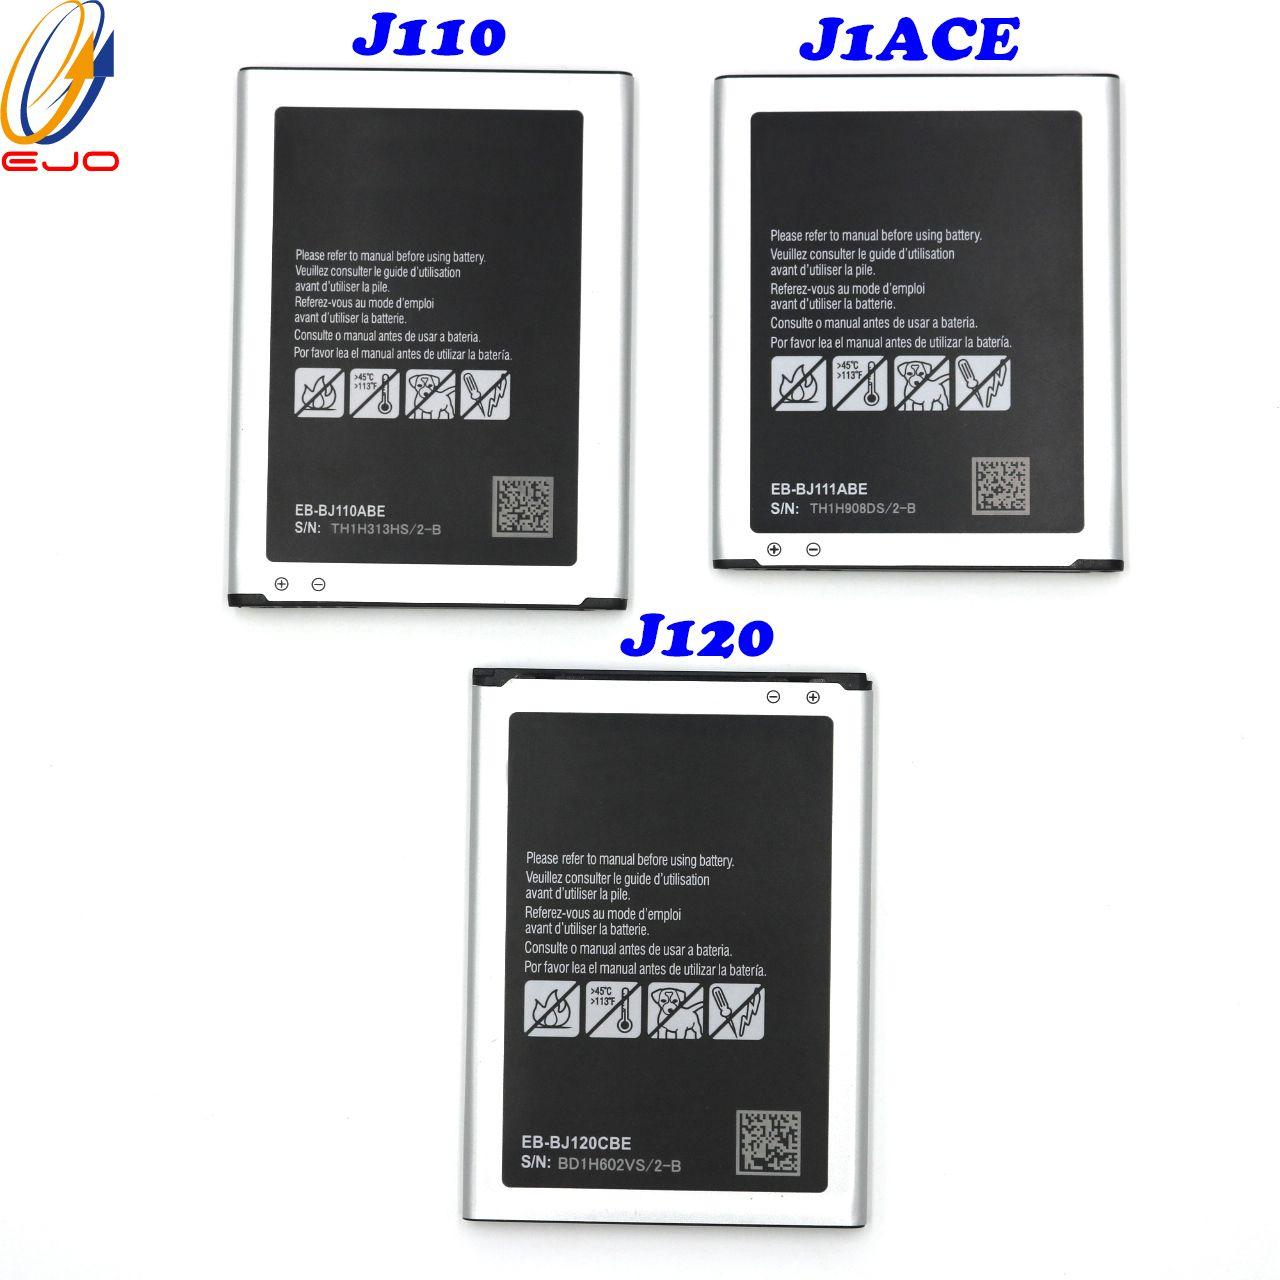 Yüksek kaliteli cep telefonu batarya tedarikçisi J111 pil, samsung Galaxy J1ACE / J110 / J120 pil Akku 50pcs